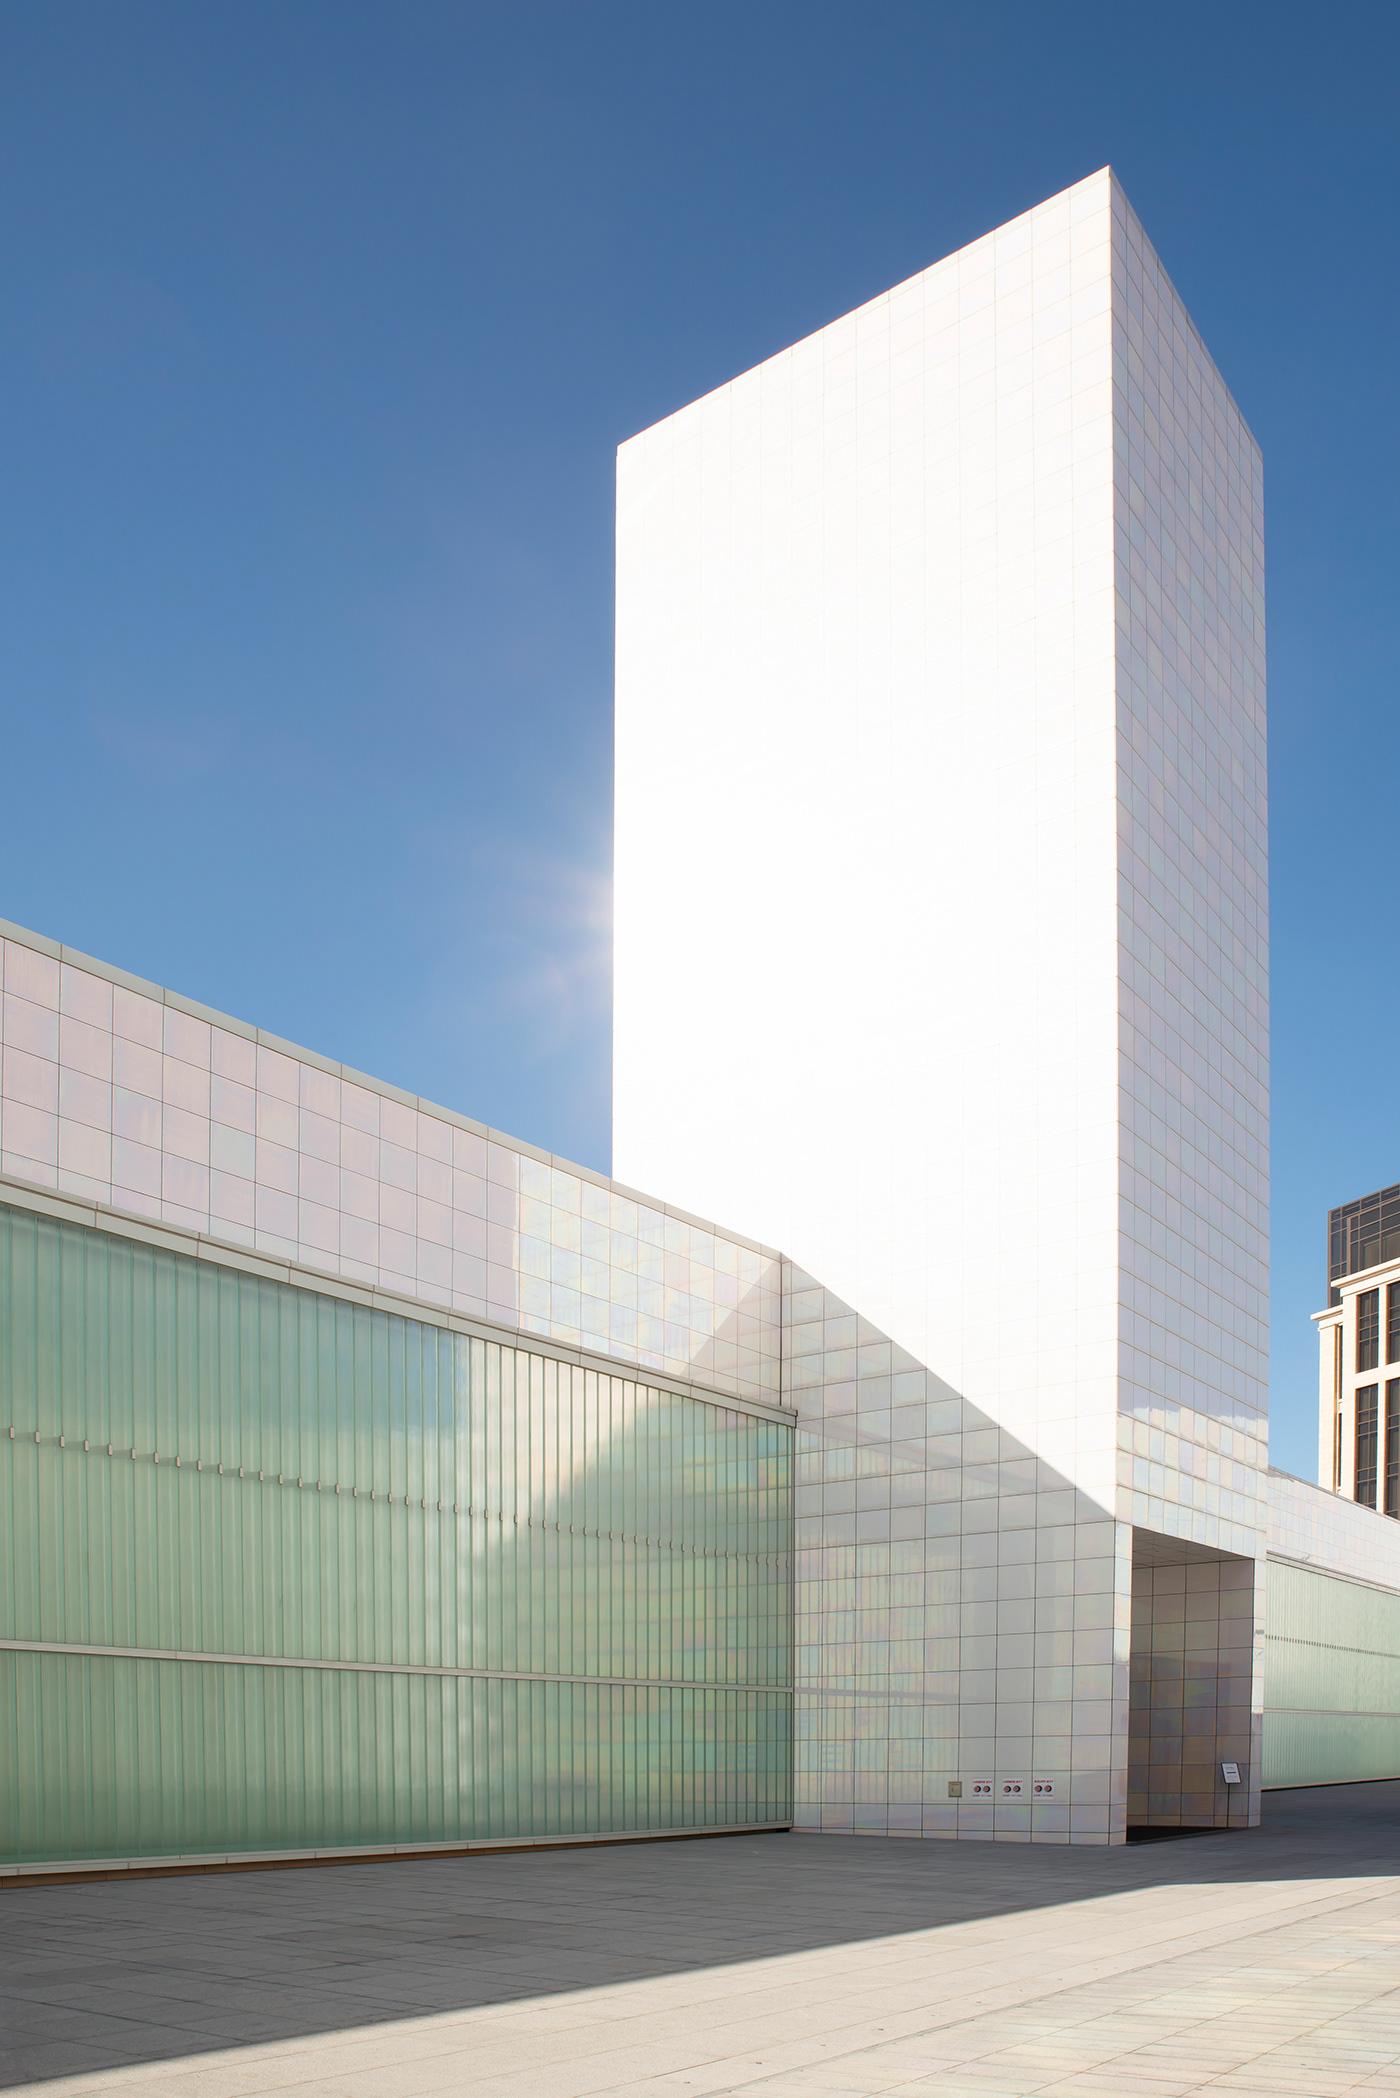 architecture arquitectura building color geometry Korea seoul South Korea urban geometry ZAHA HADID